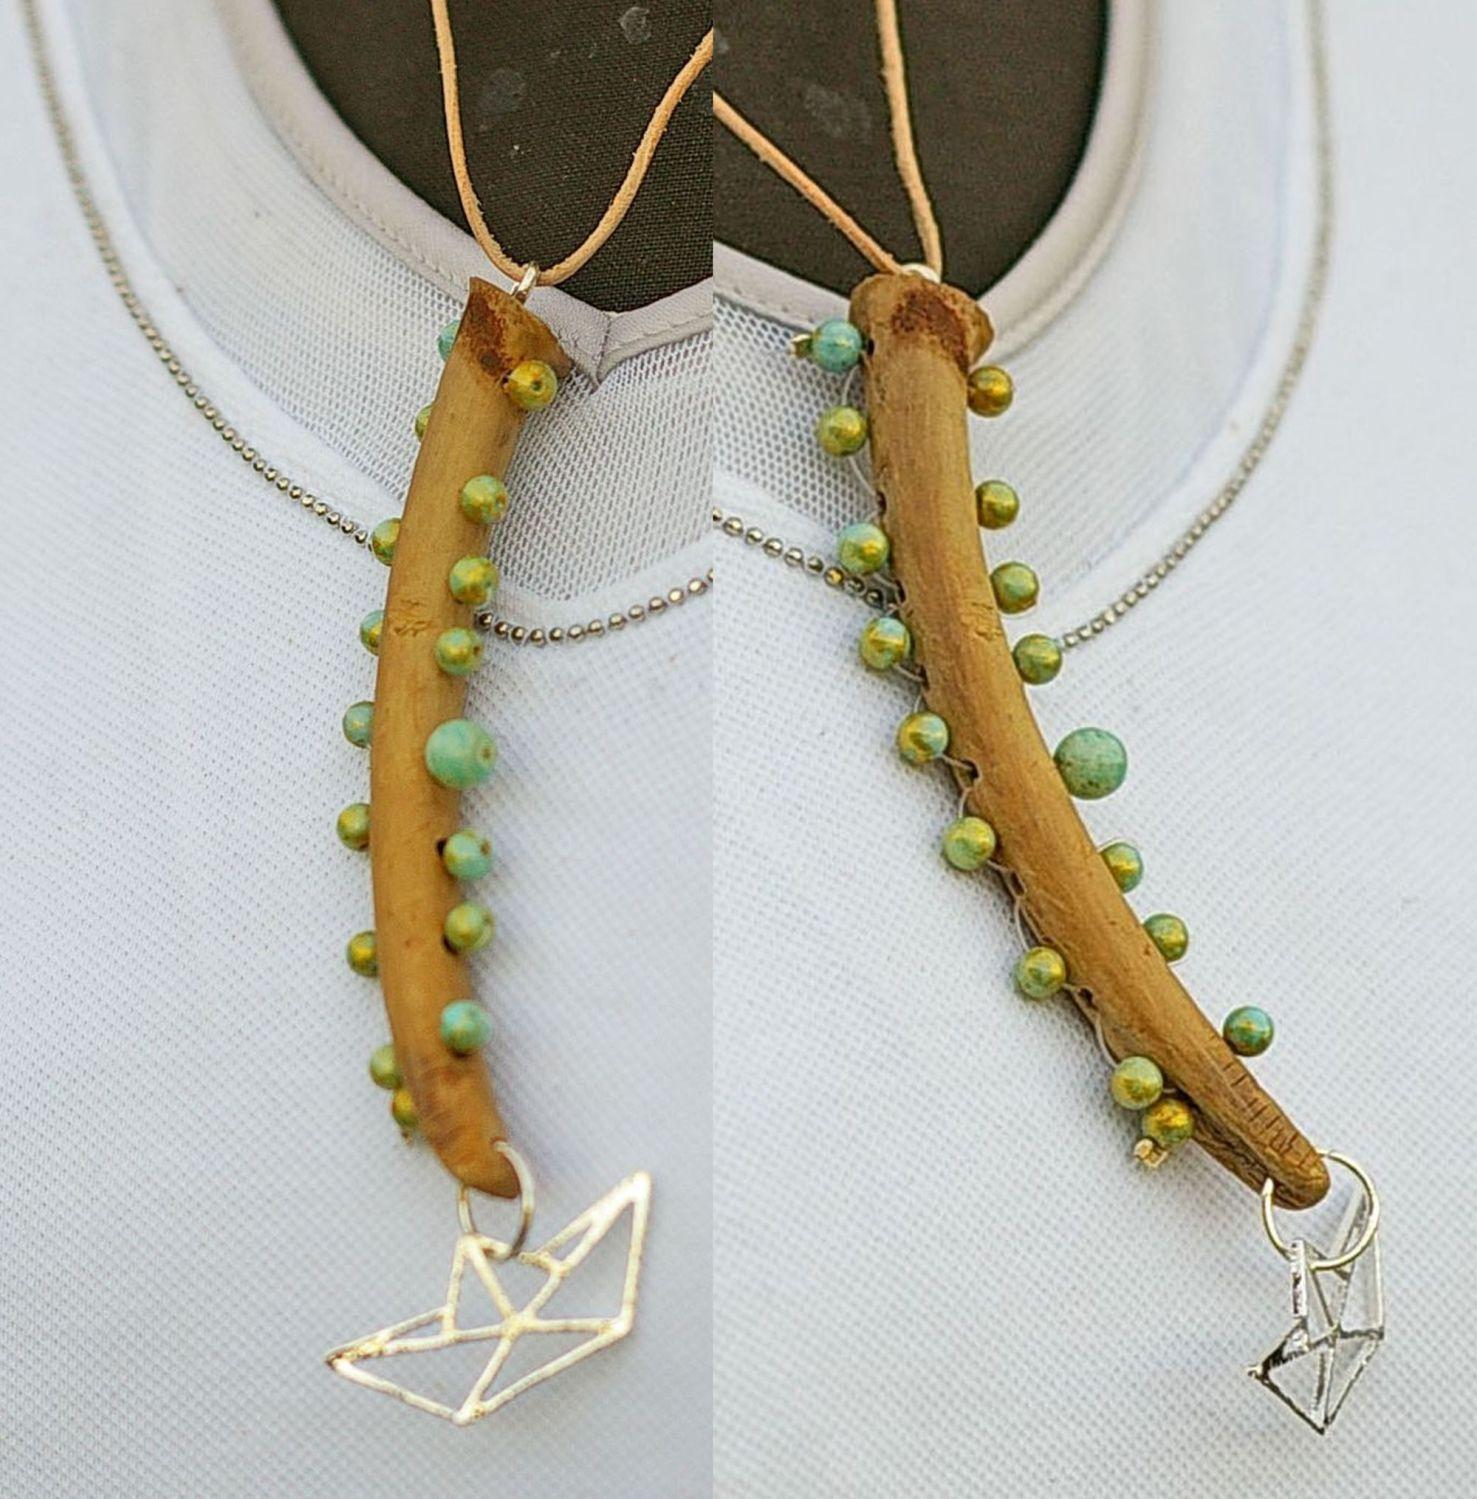 diy kettenanhänger aus treibholz, diy  driftwood jewellery